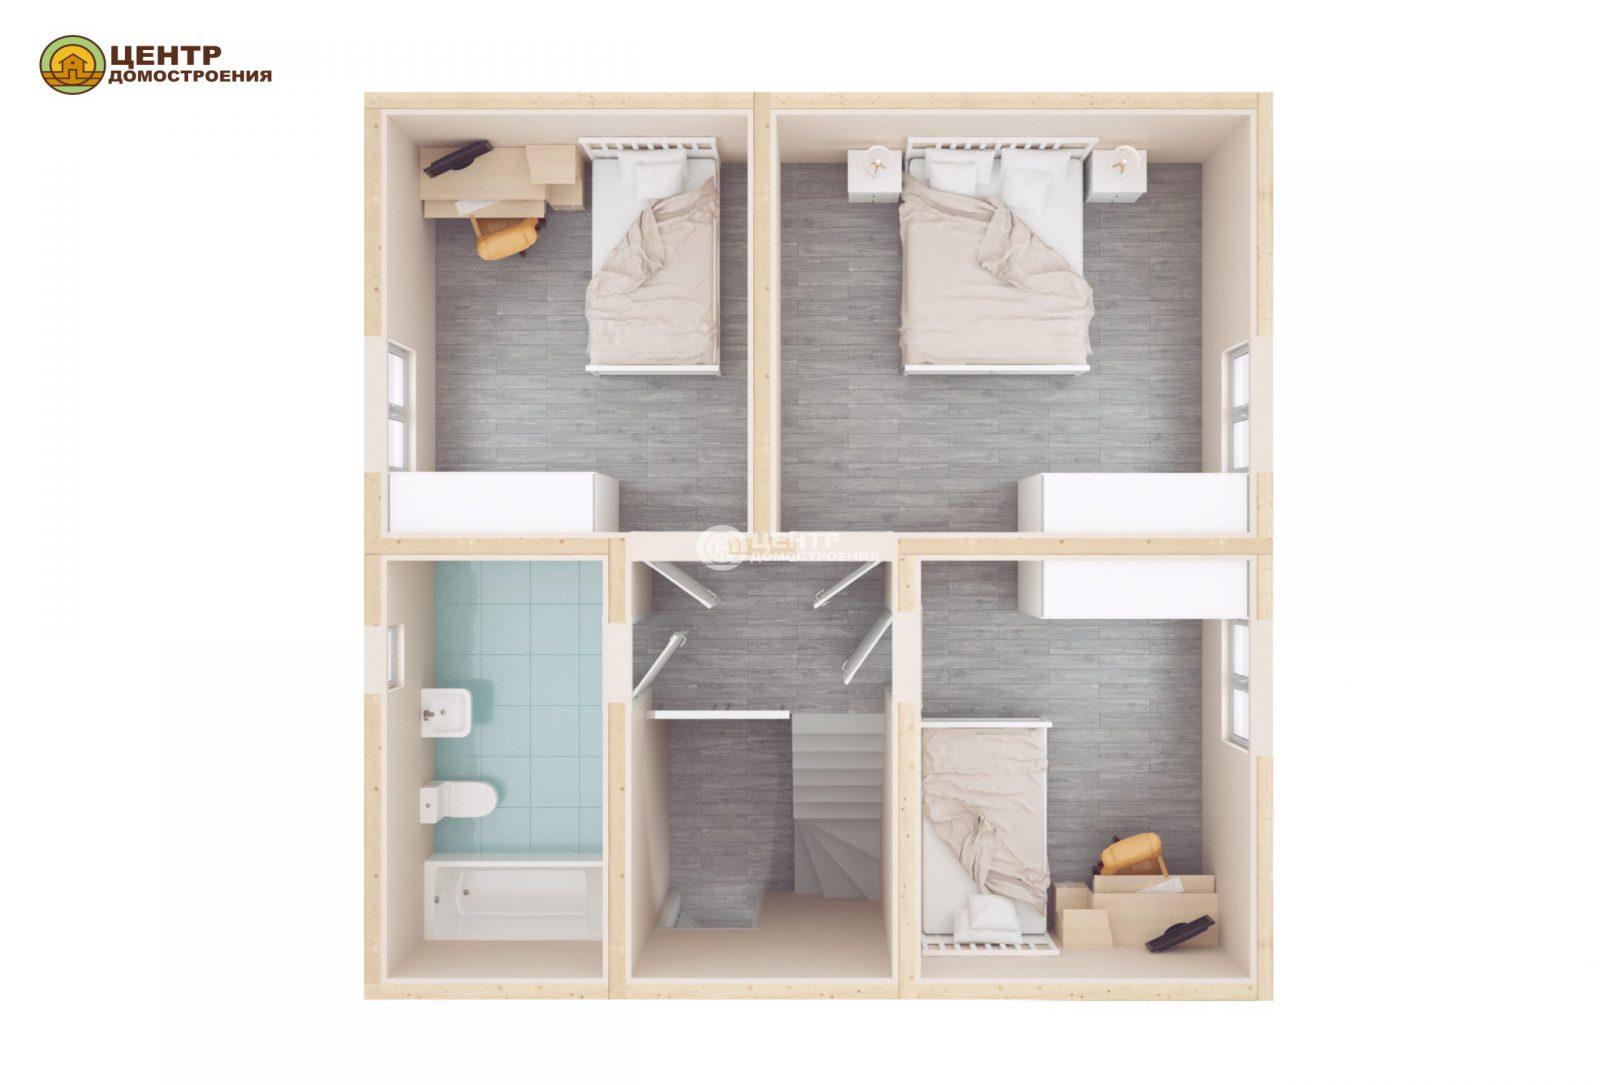 Проект дома с мансардой 8 на 9